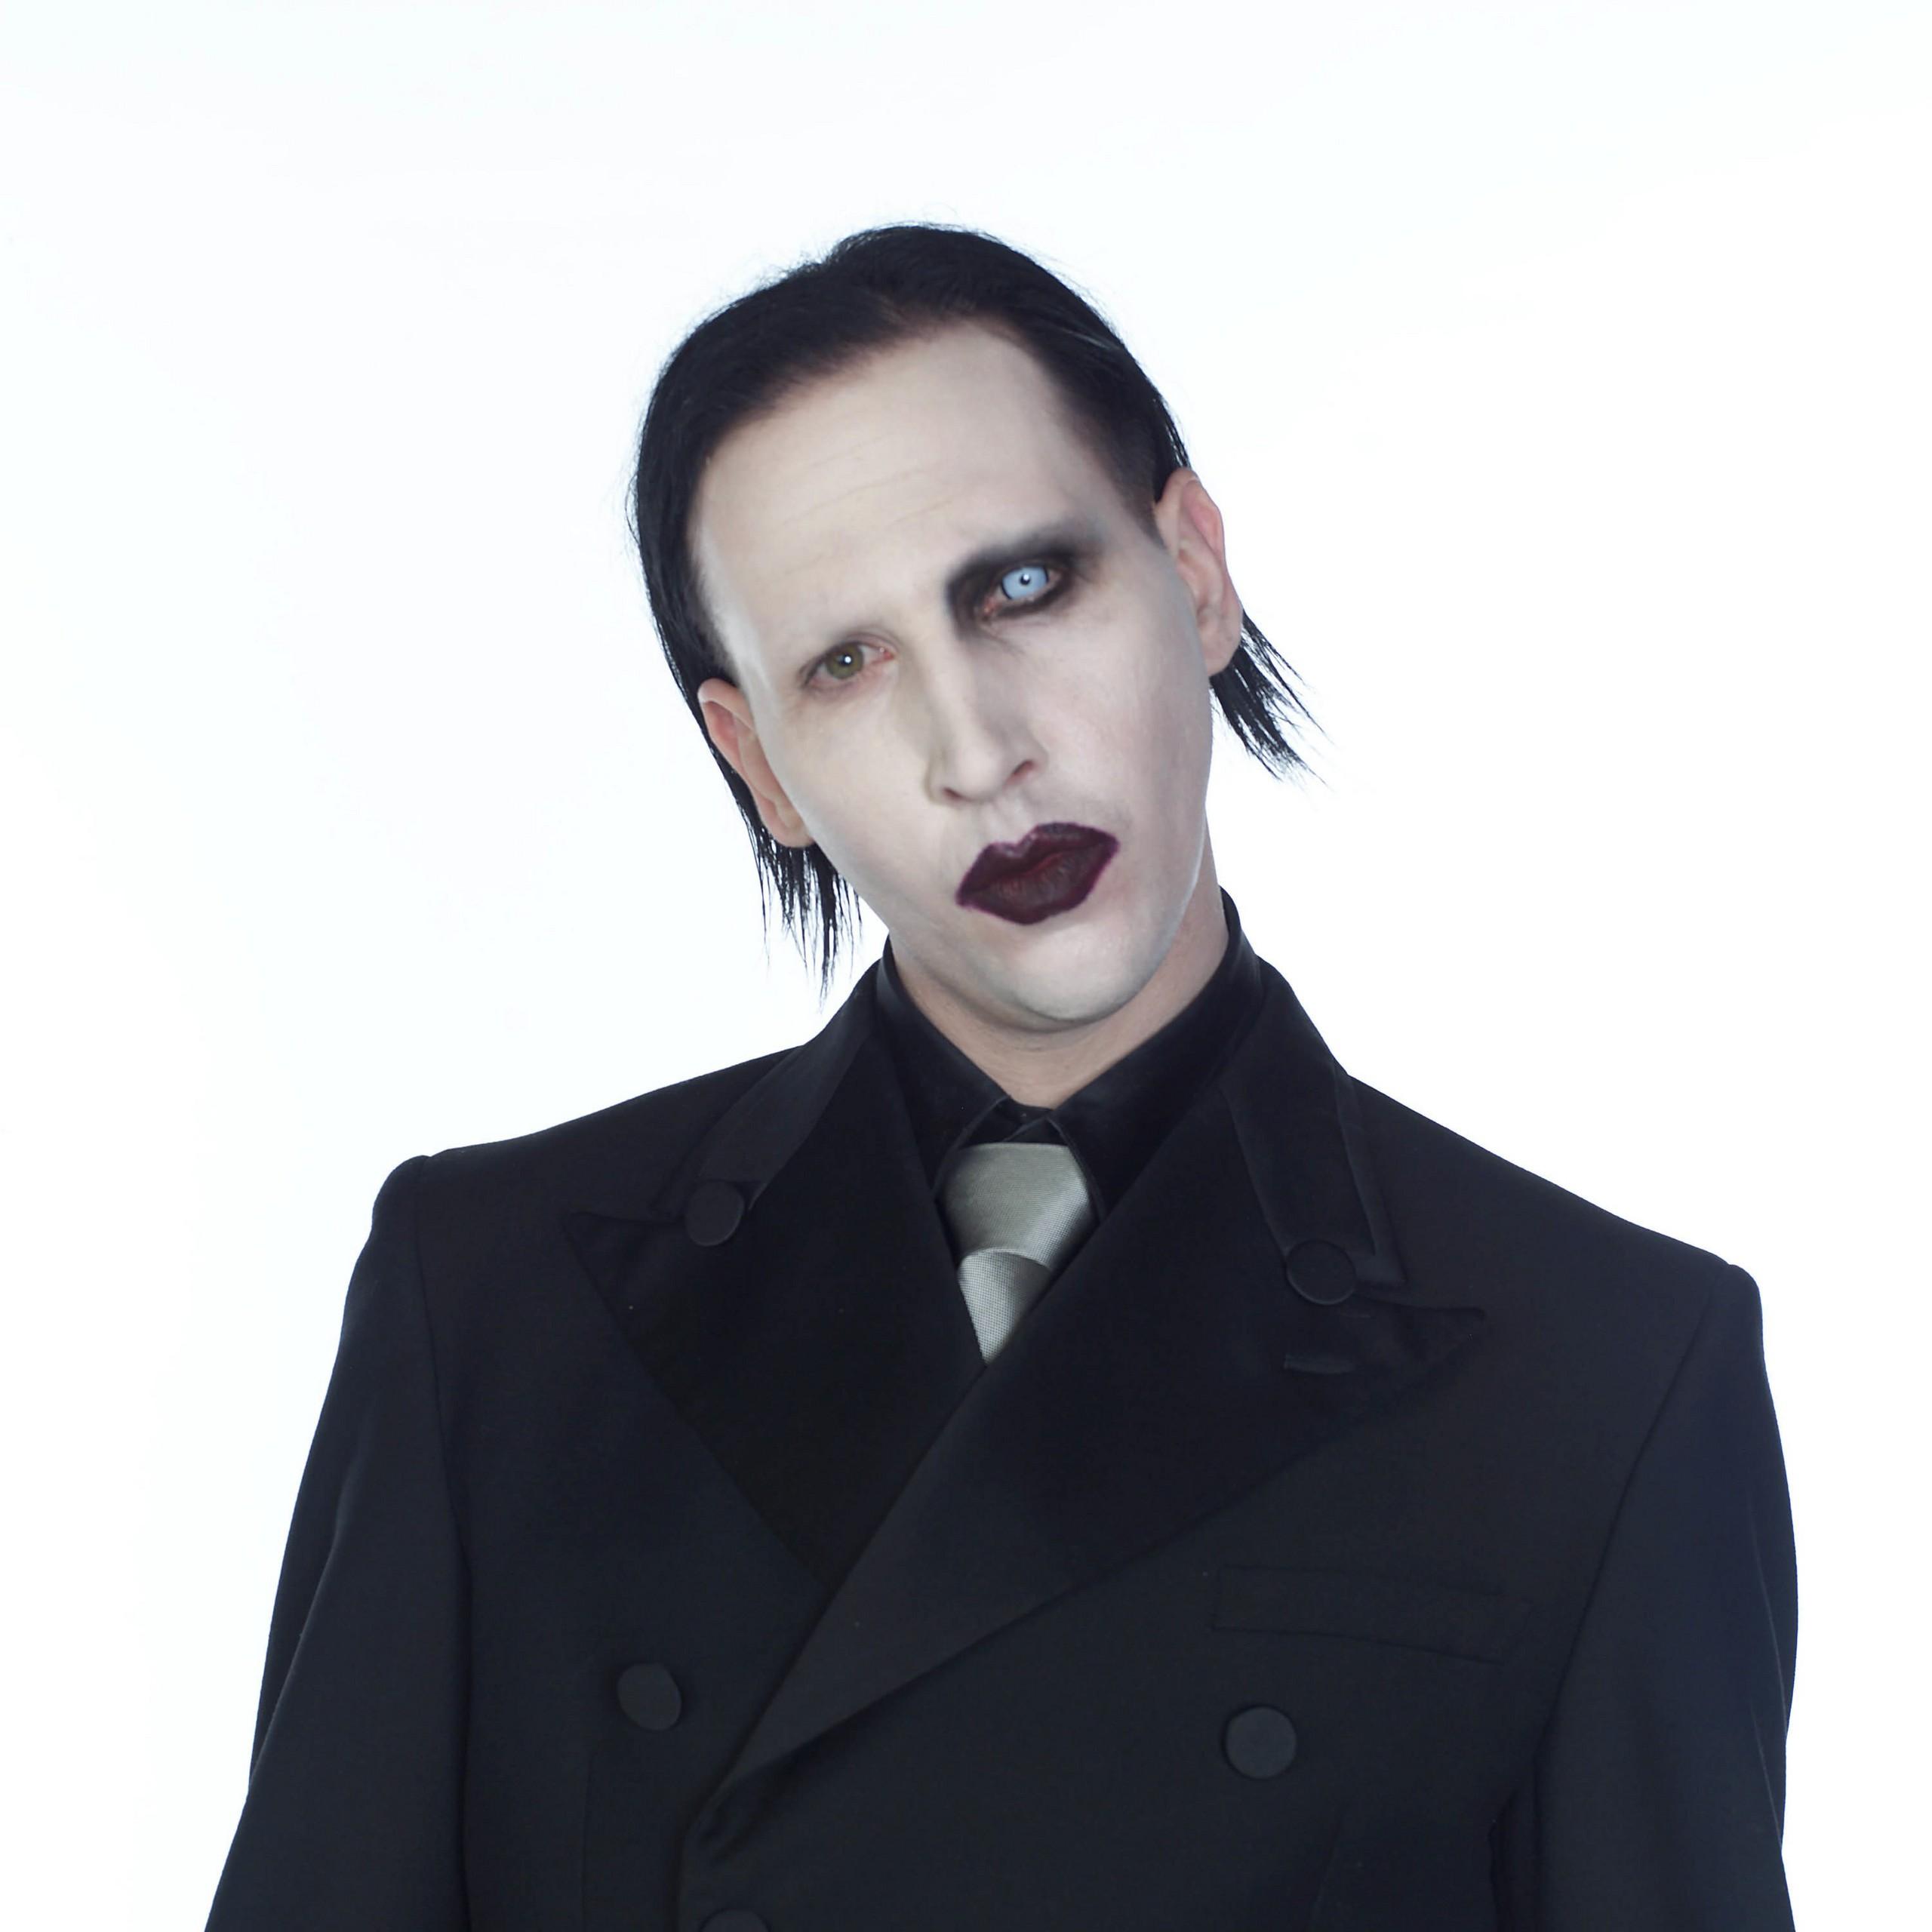 Marilyn Manson - Marilyn Manson Photo (29937275) - Fanpop